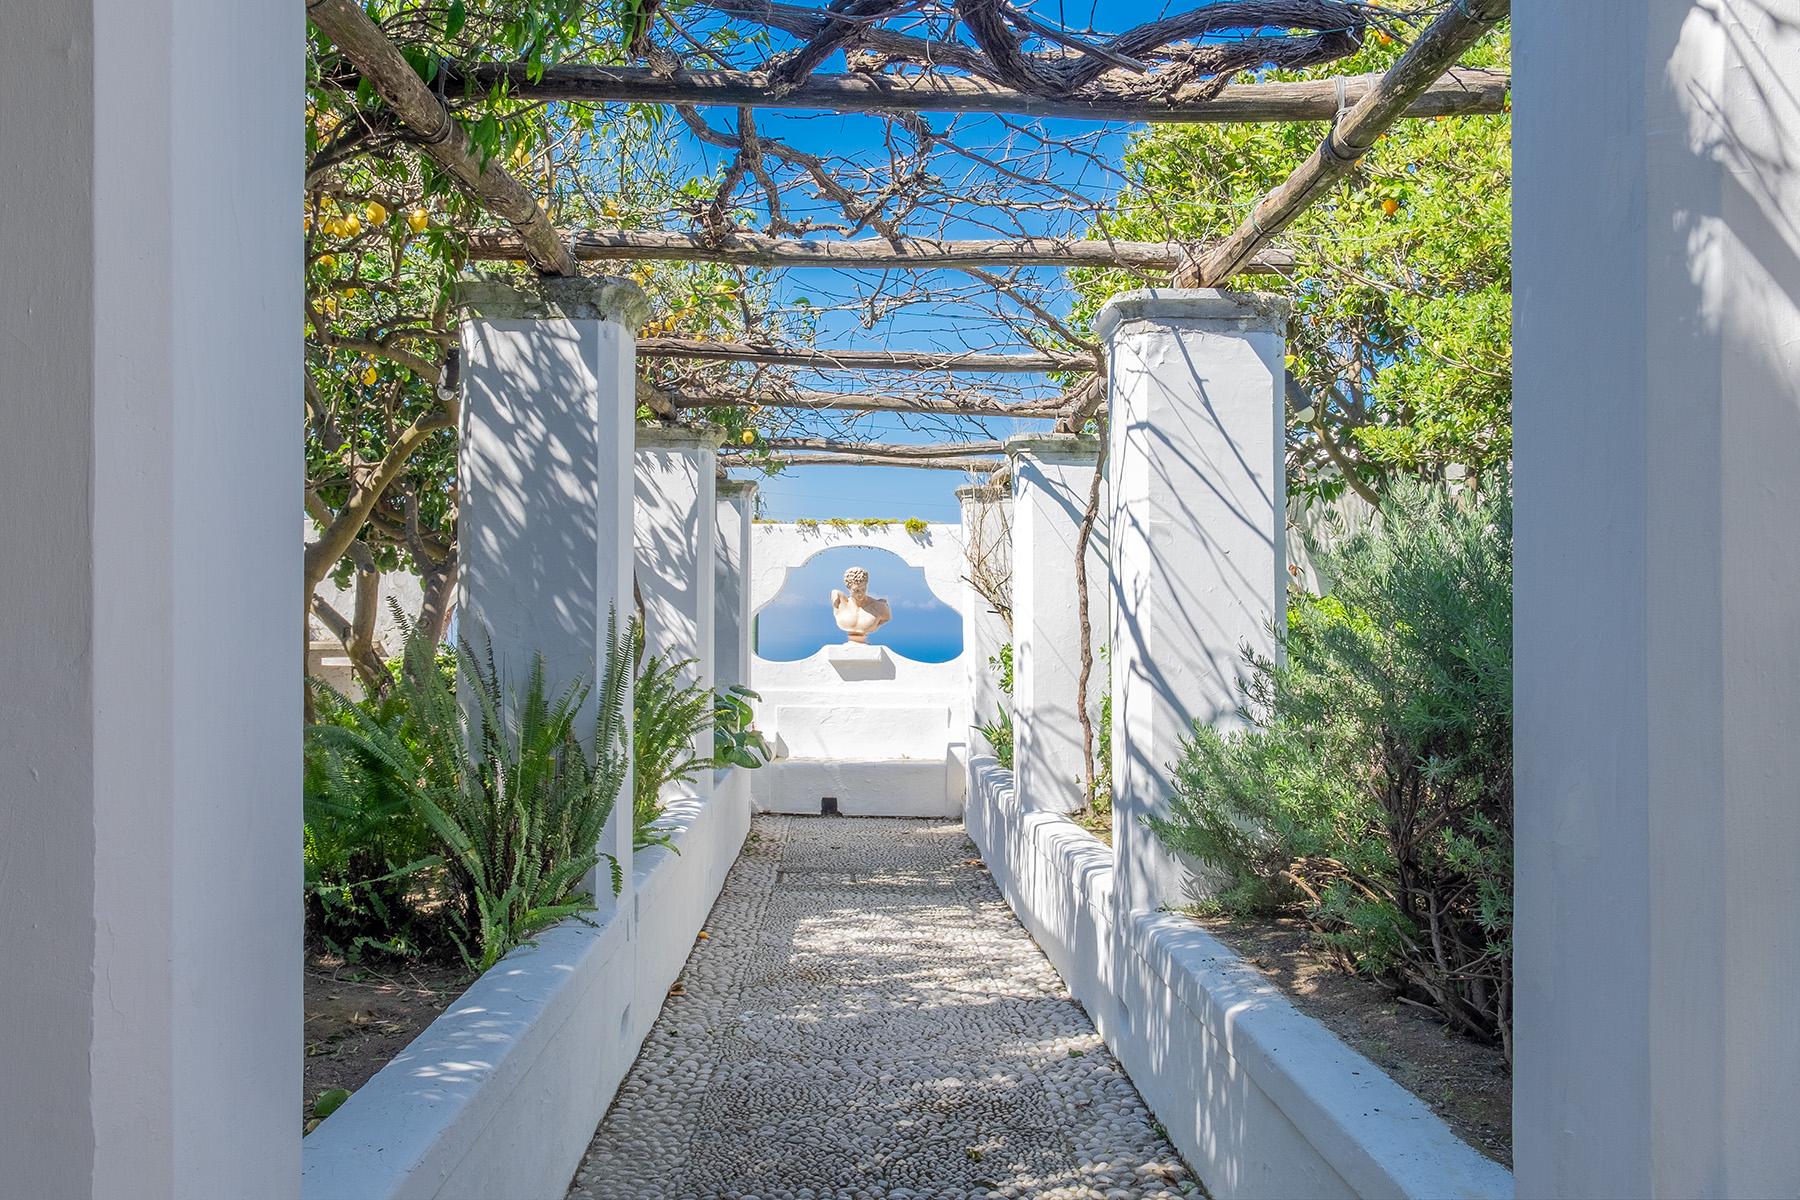 Casa indipendente in Vendita a Capri: 5 locali, 300 mq - Foto 5